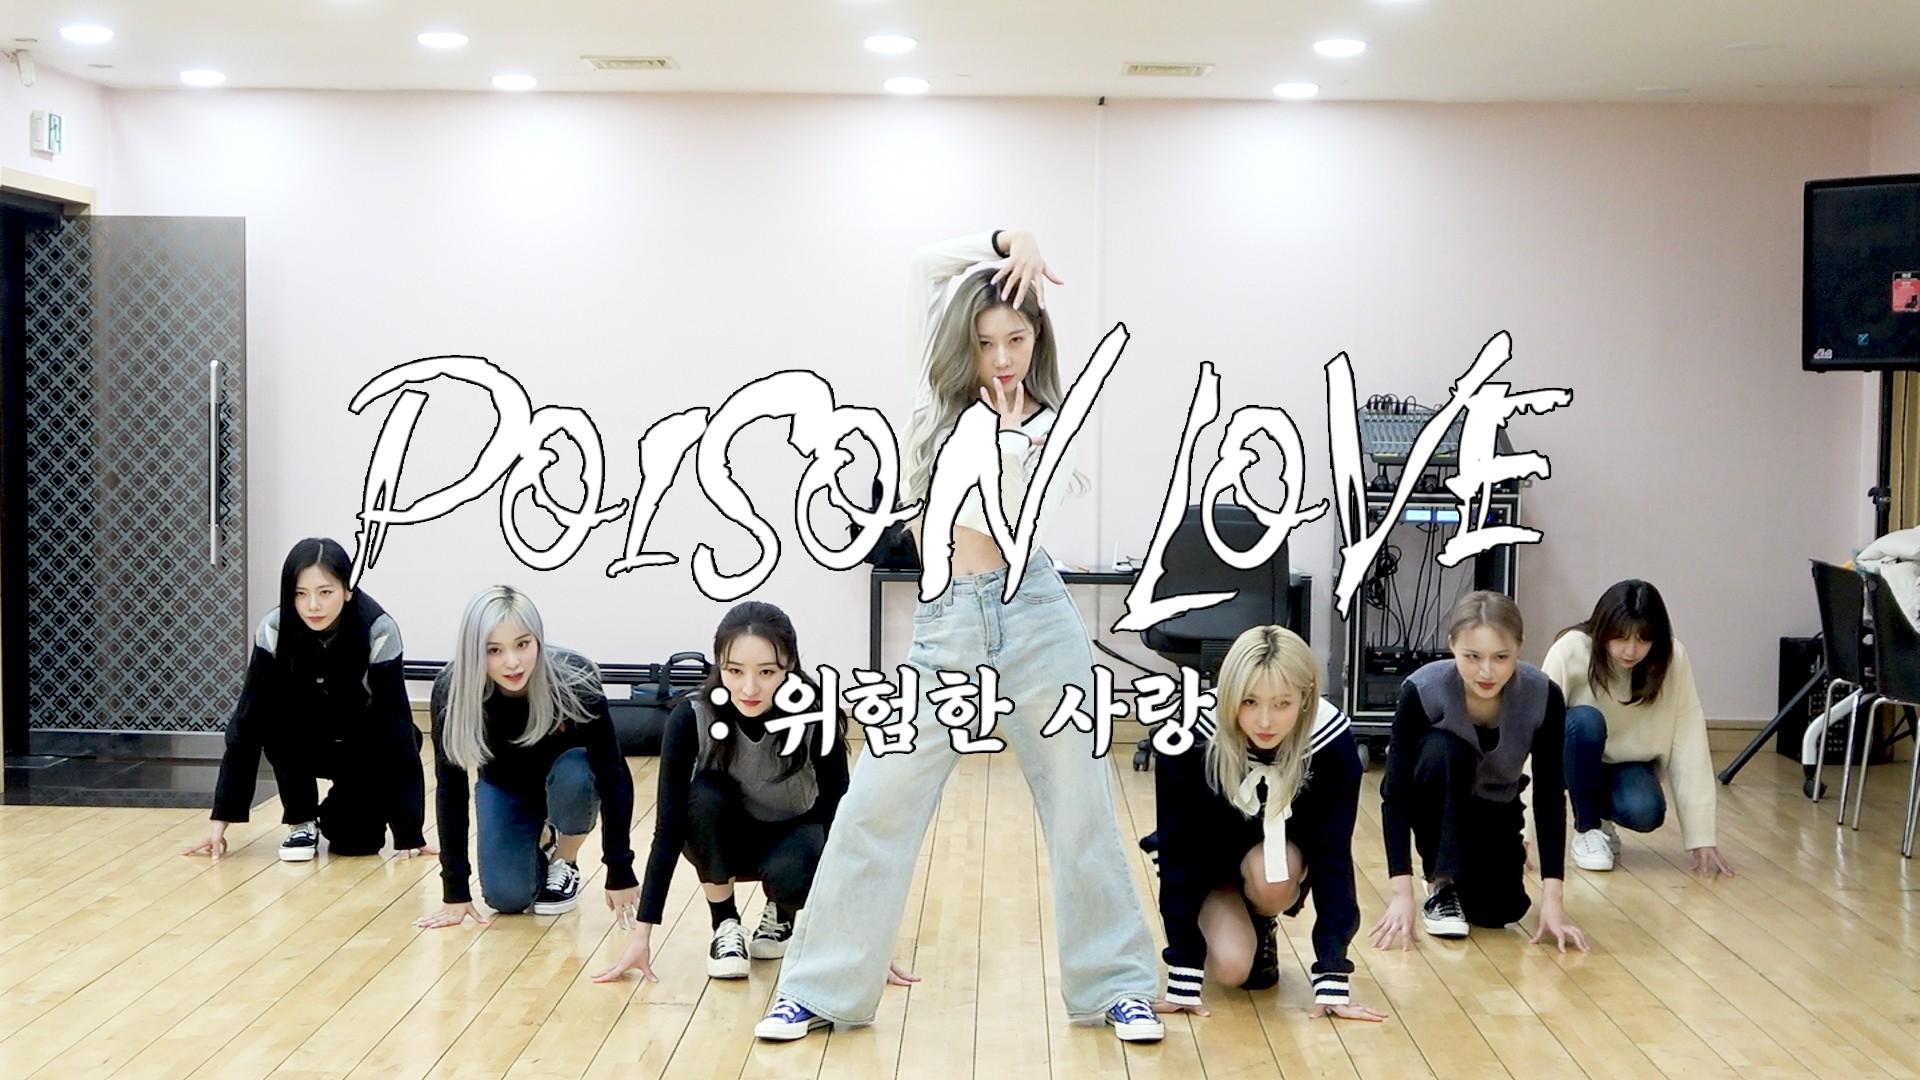 [Special Clip] Dreamcatcher(드림캐쳐) 'Poison Love' 자체 제작 MV